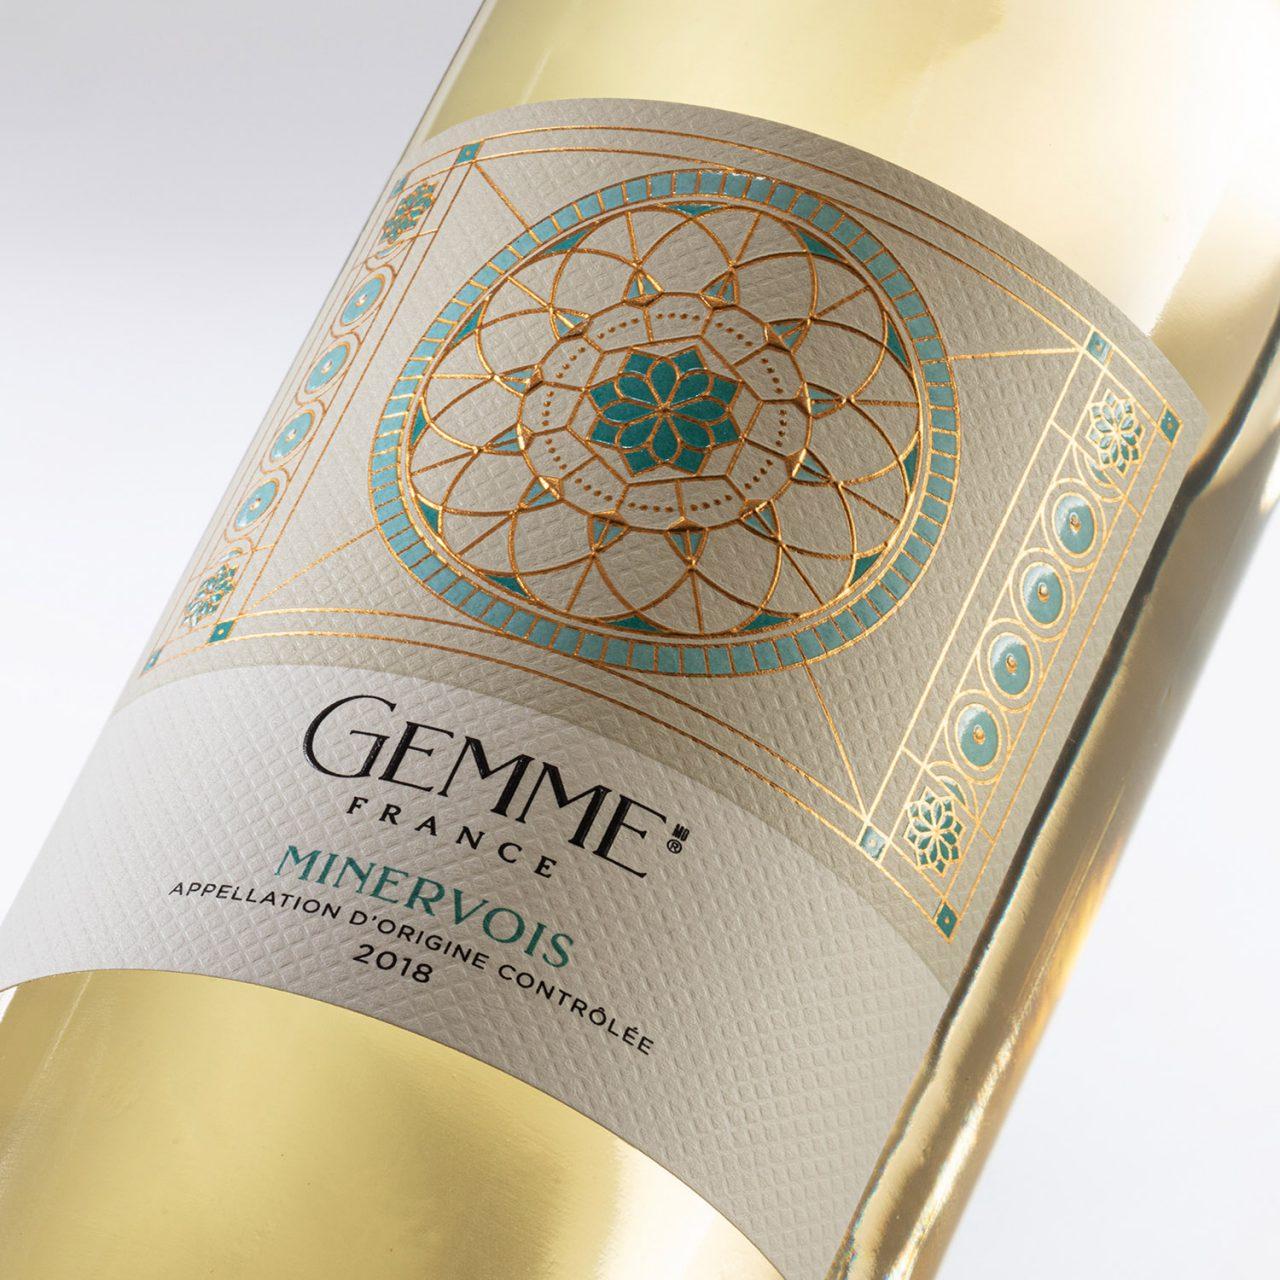 Gemme wine packaging – Design d'étiquette de vin -BRAND & DESIGN